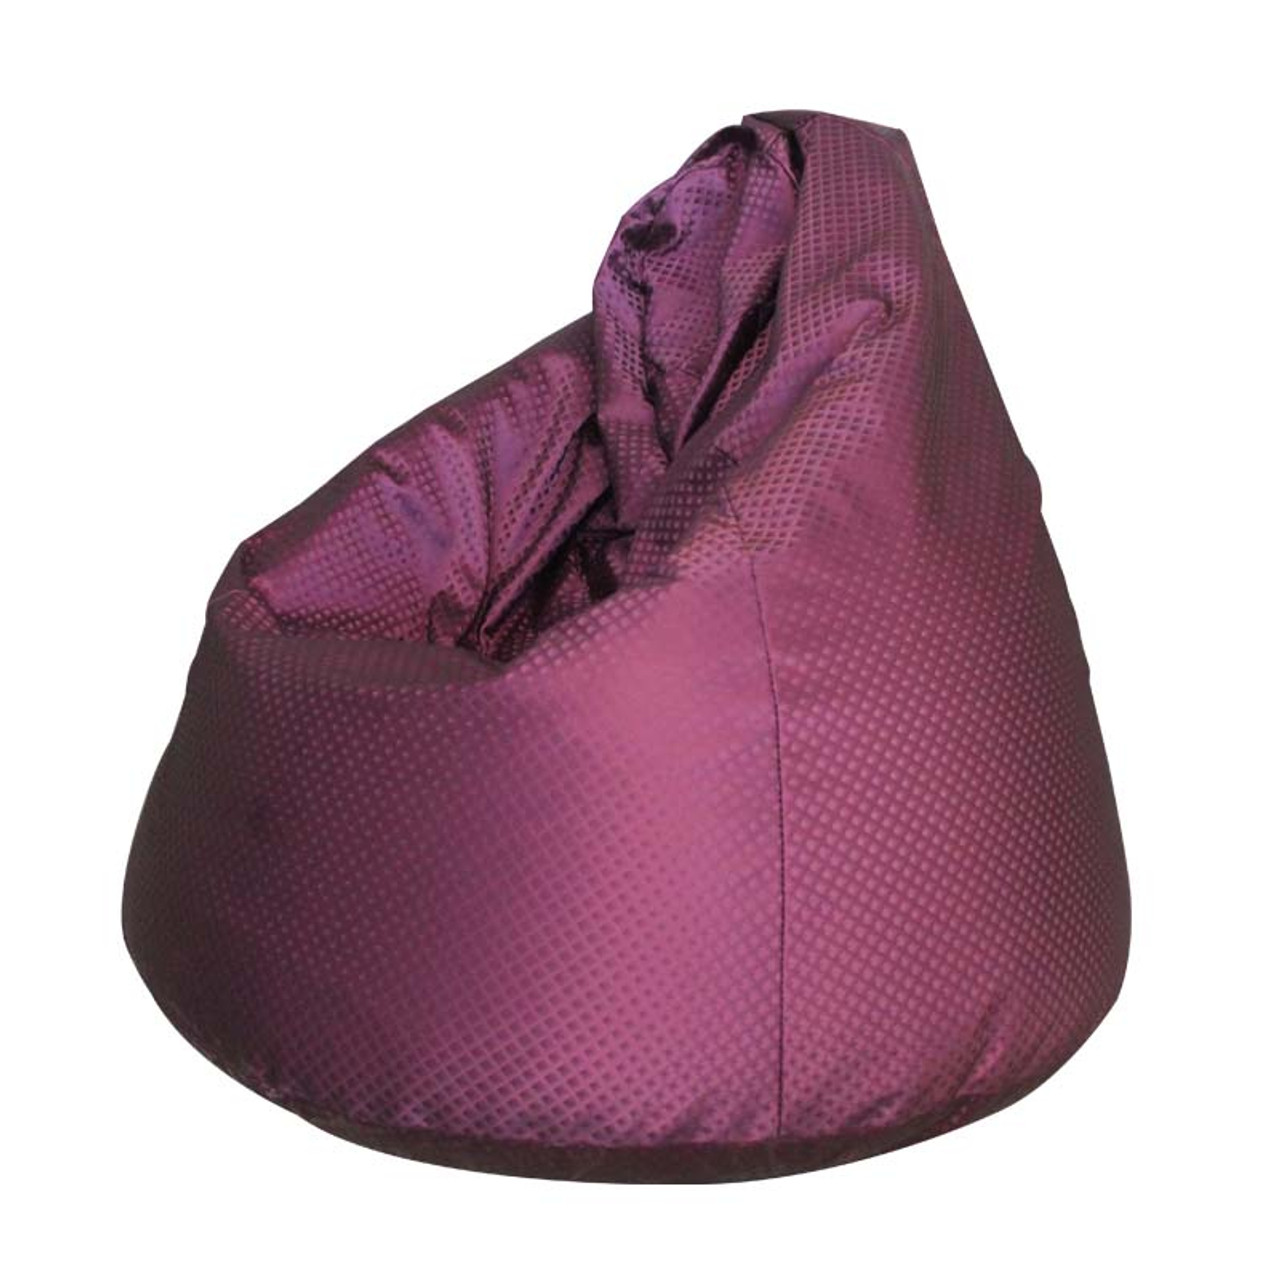 Marvelous Bono Bean Bag Kian Contract Com My Machost Co Dining Chair Design Ideas Machostcouk